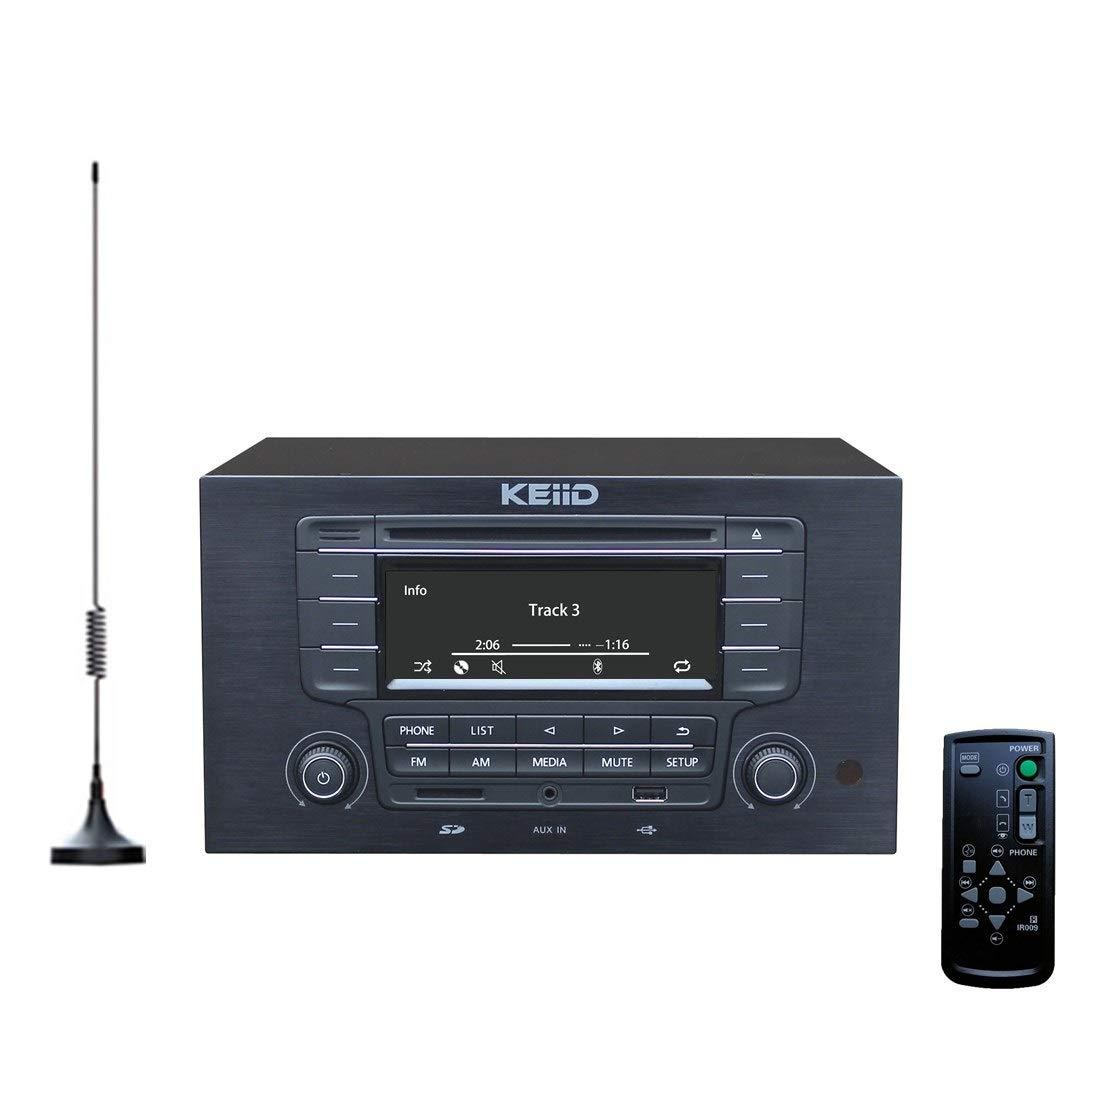 KEiiD Amplifier Bluetooth Receiver Headphone